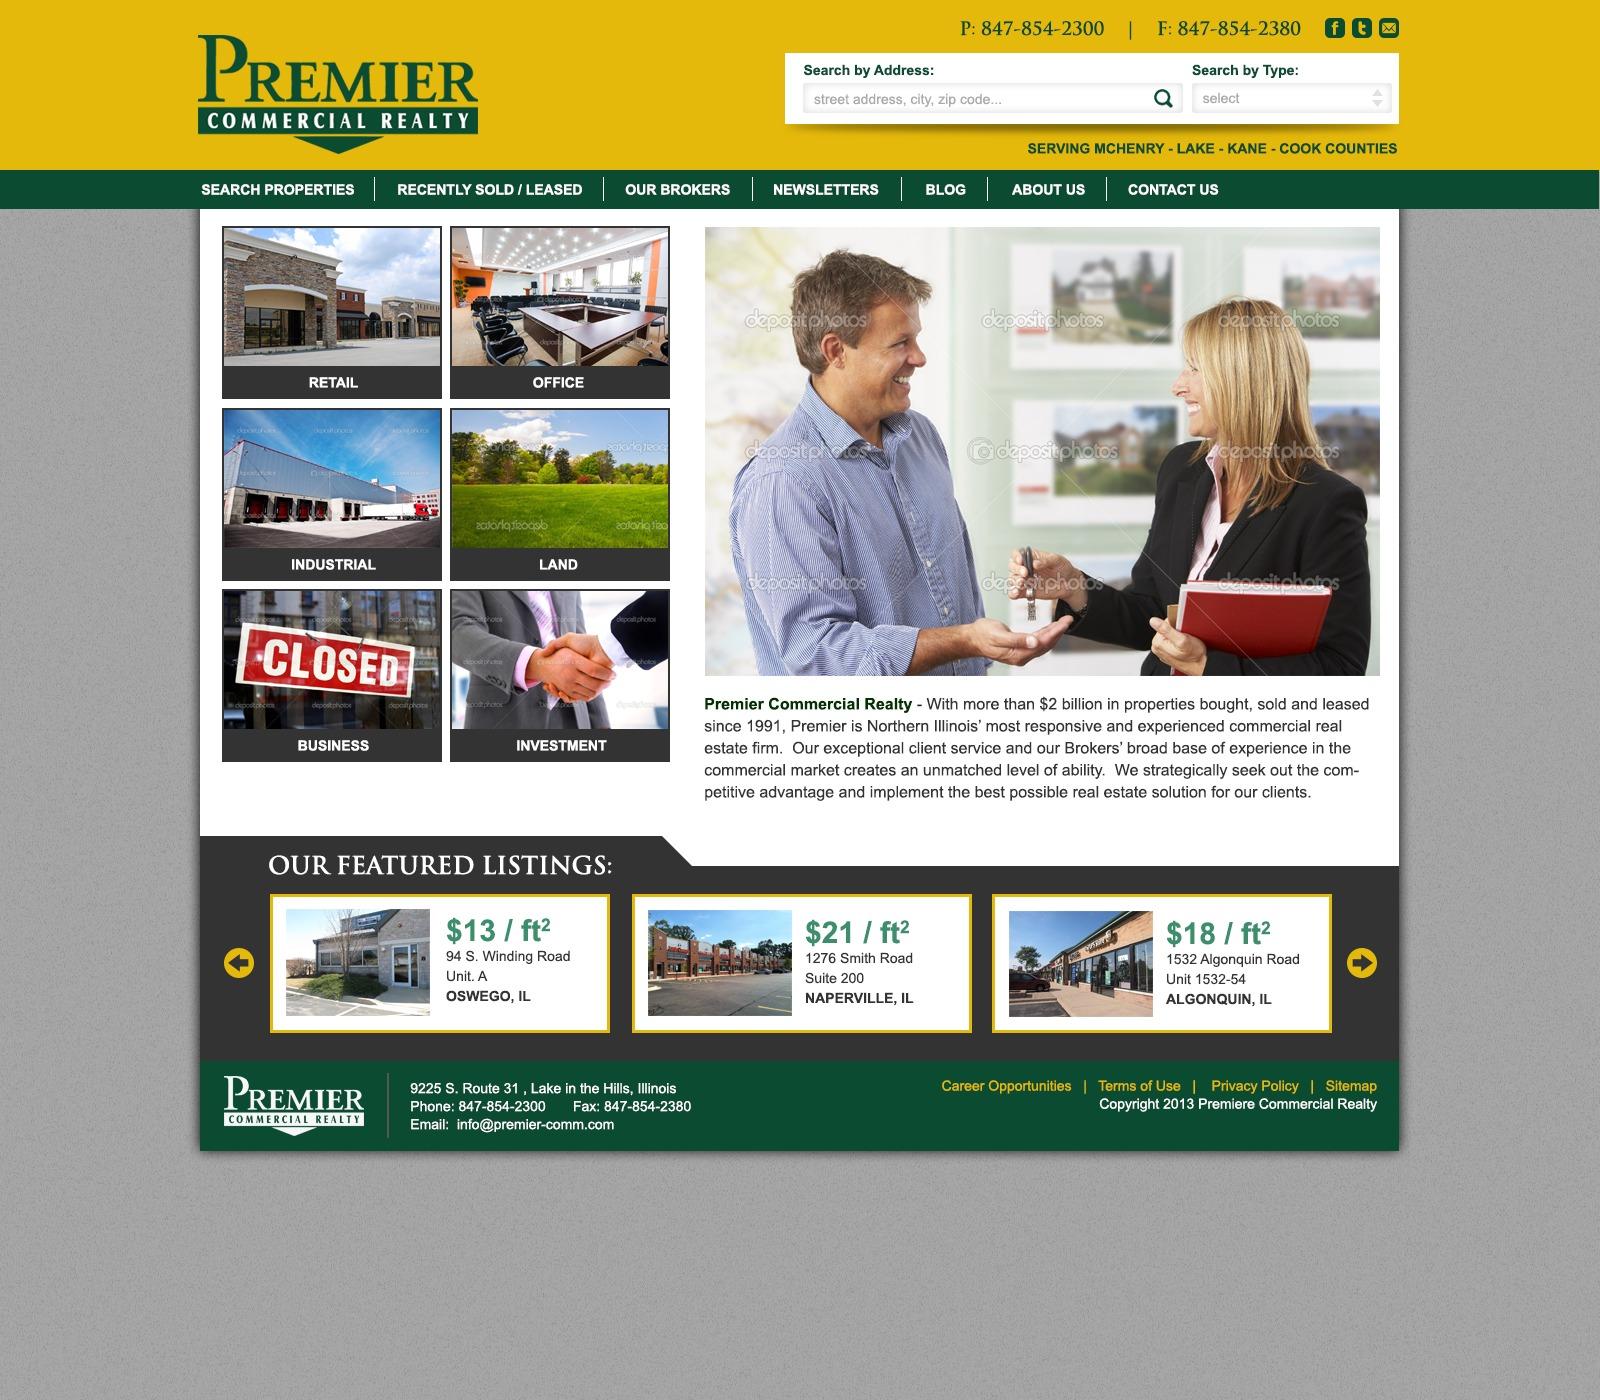 wordpress website template sullivan roofing theme by launch digital